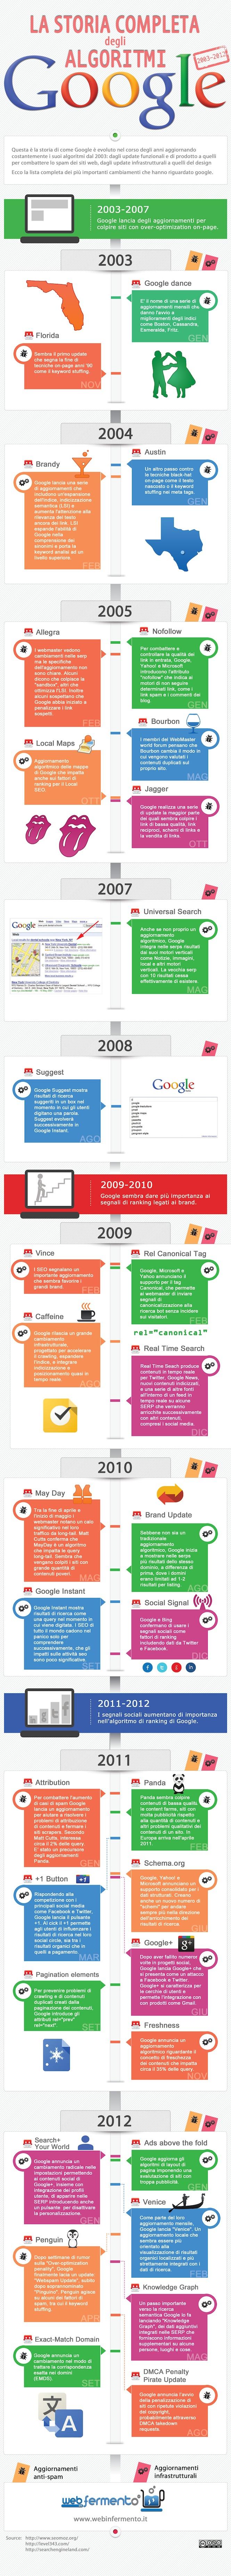 Google-algoritmi-infografica-ITA